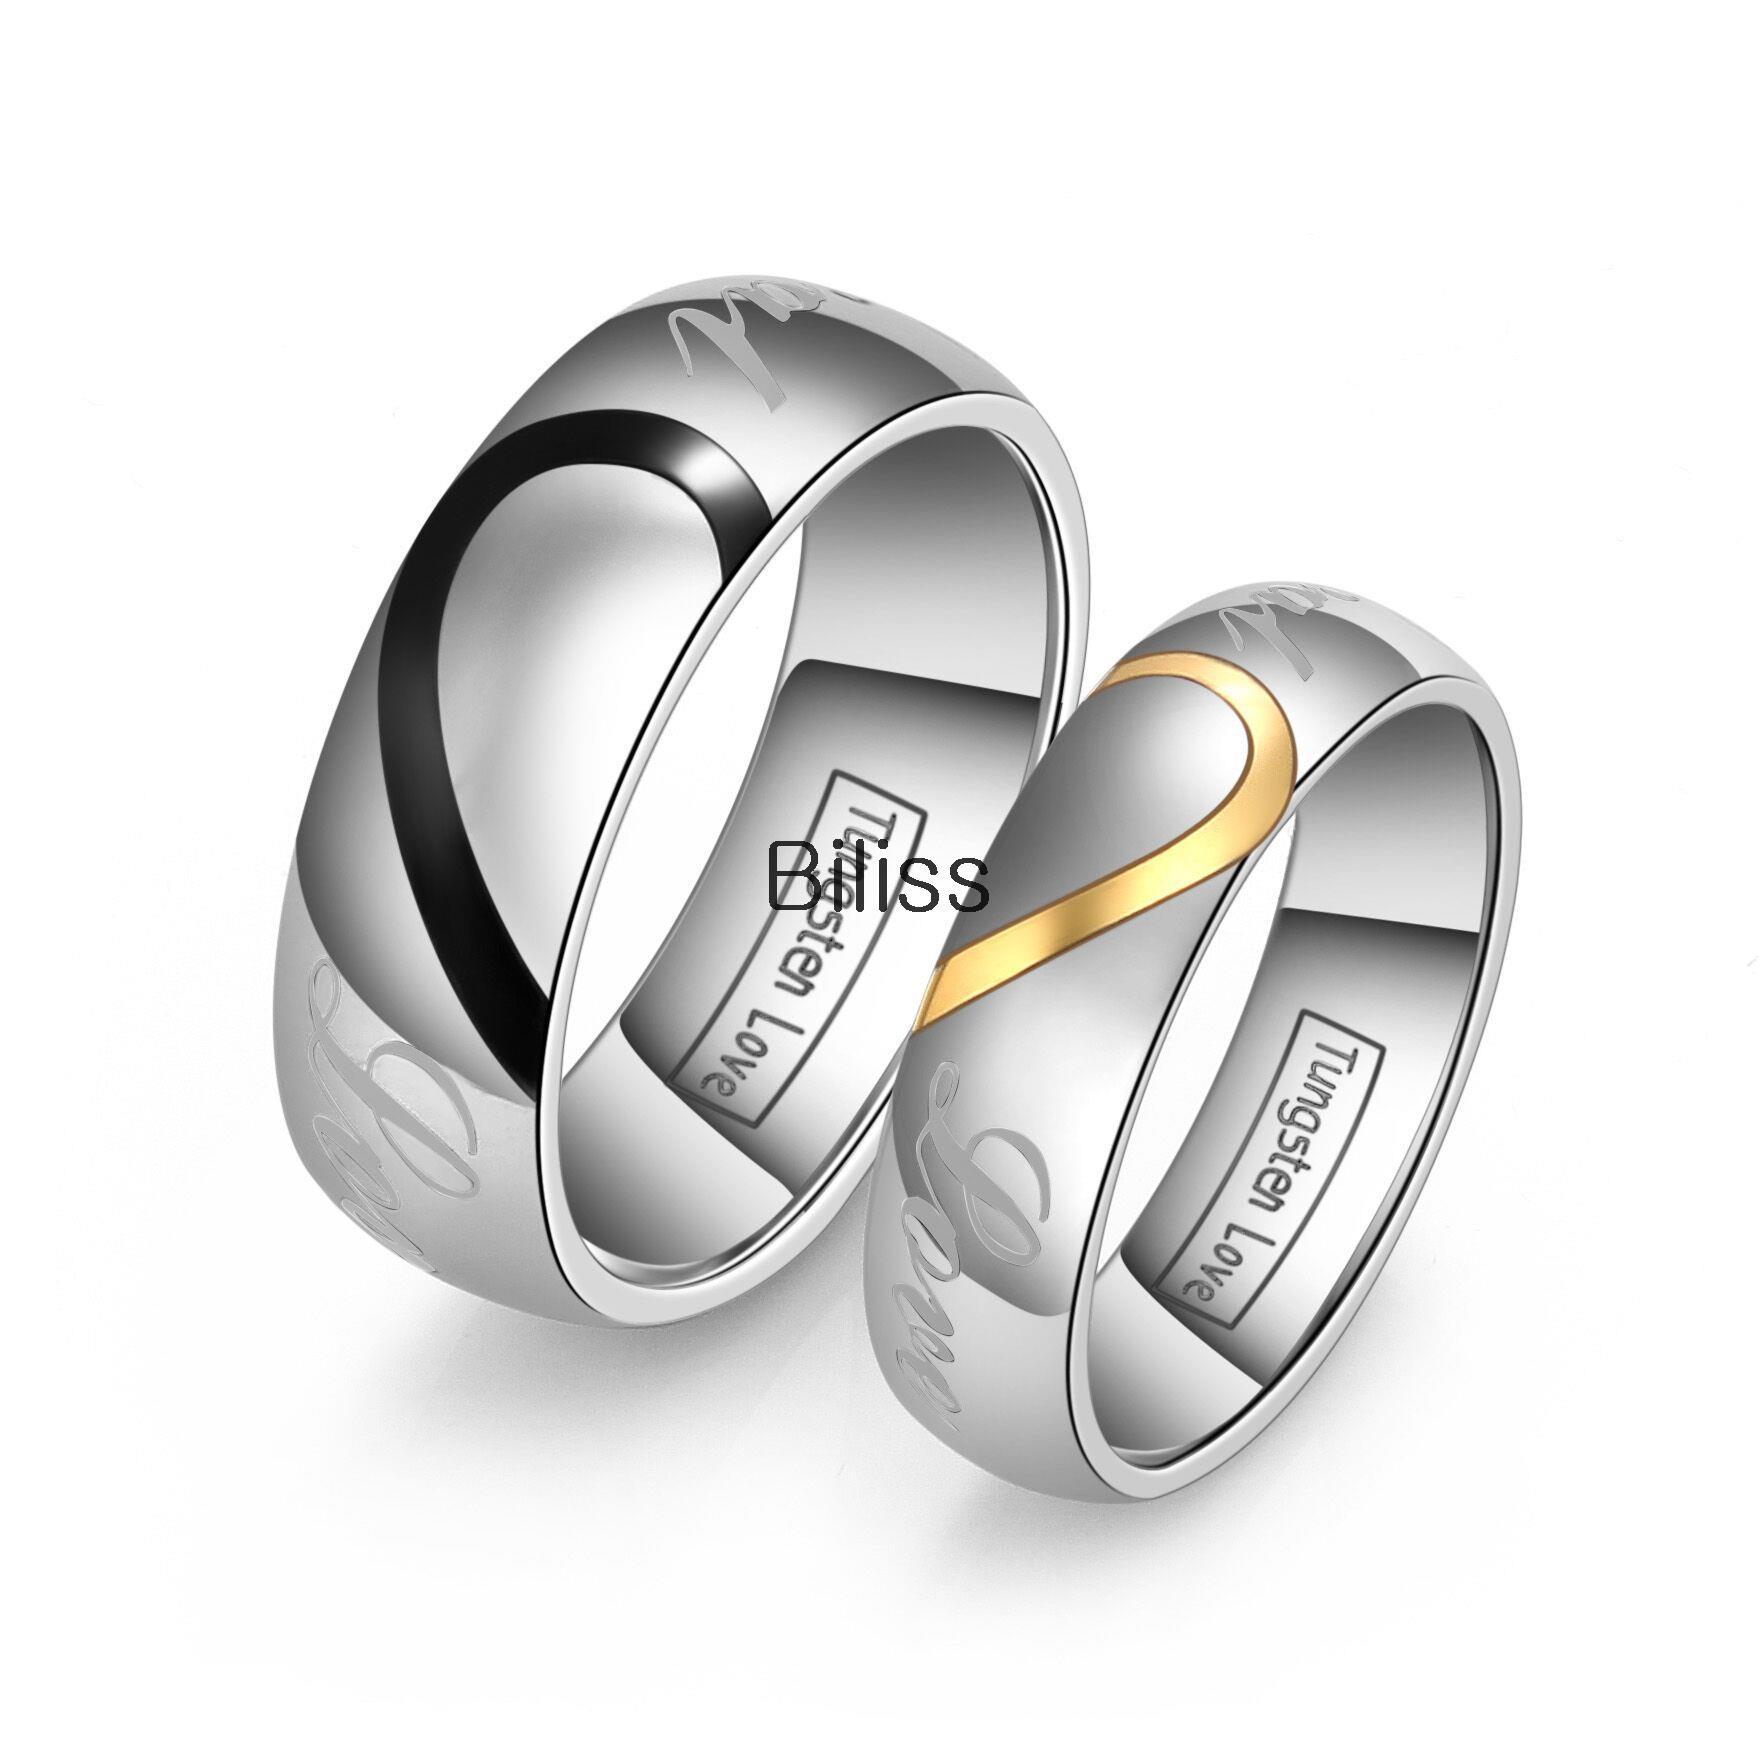 tungsten wedding band Black Diamond Tungsten Carbide Men s Wedding Ring Band 8mm classic engagement eBay